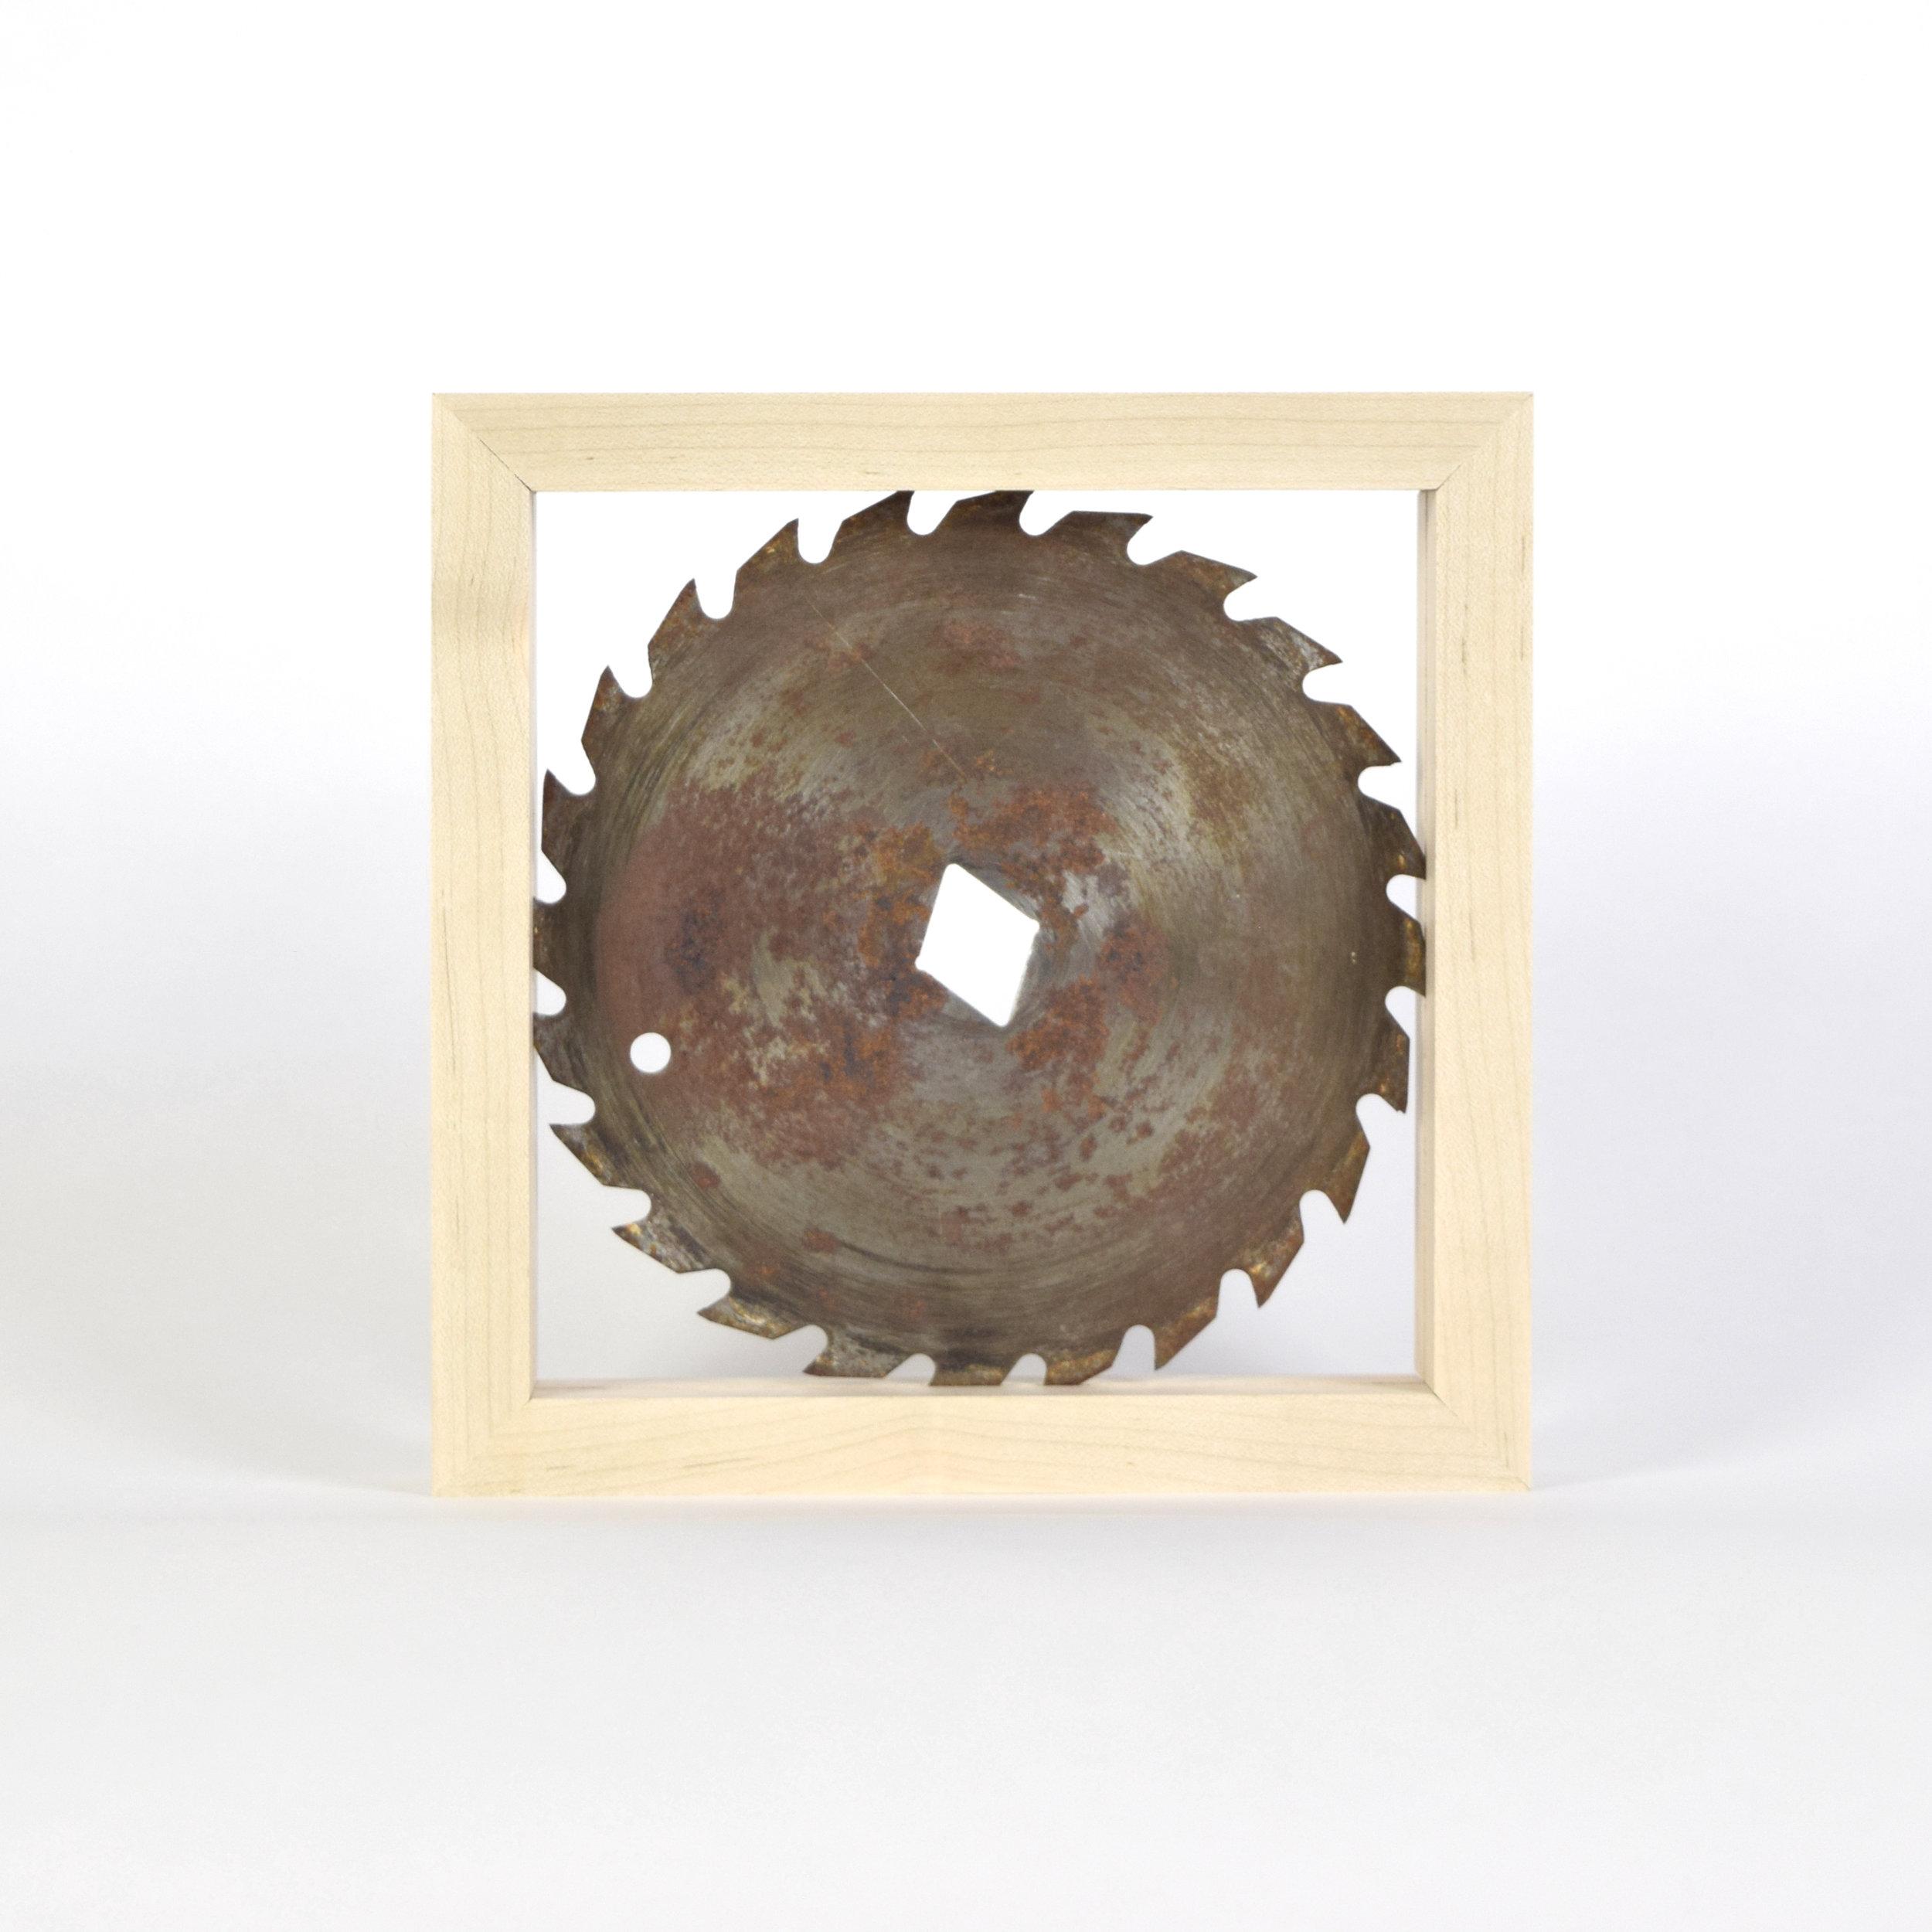 Circular Saw, 8.5x8.5x2